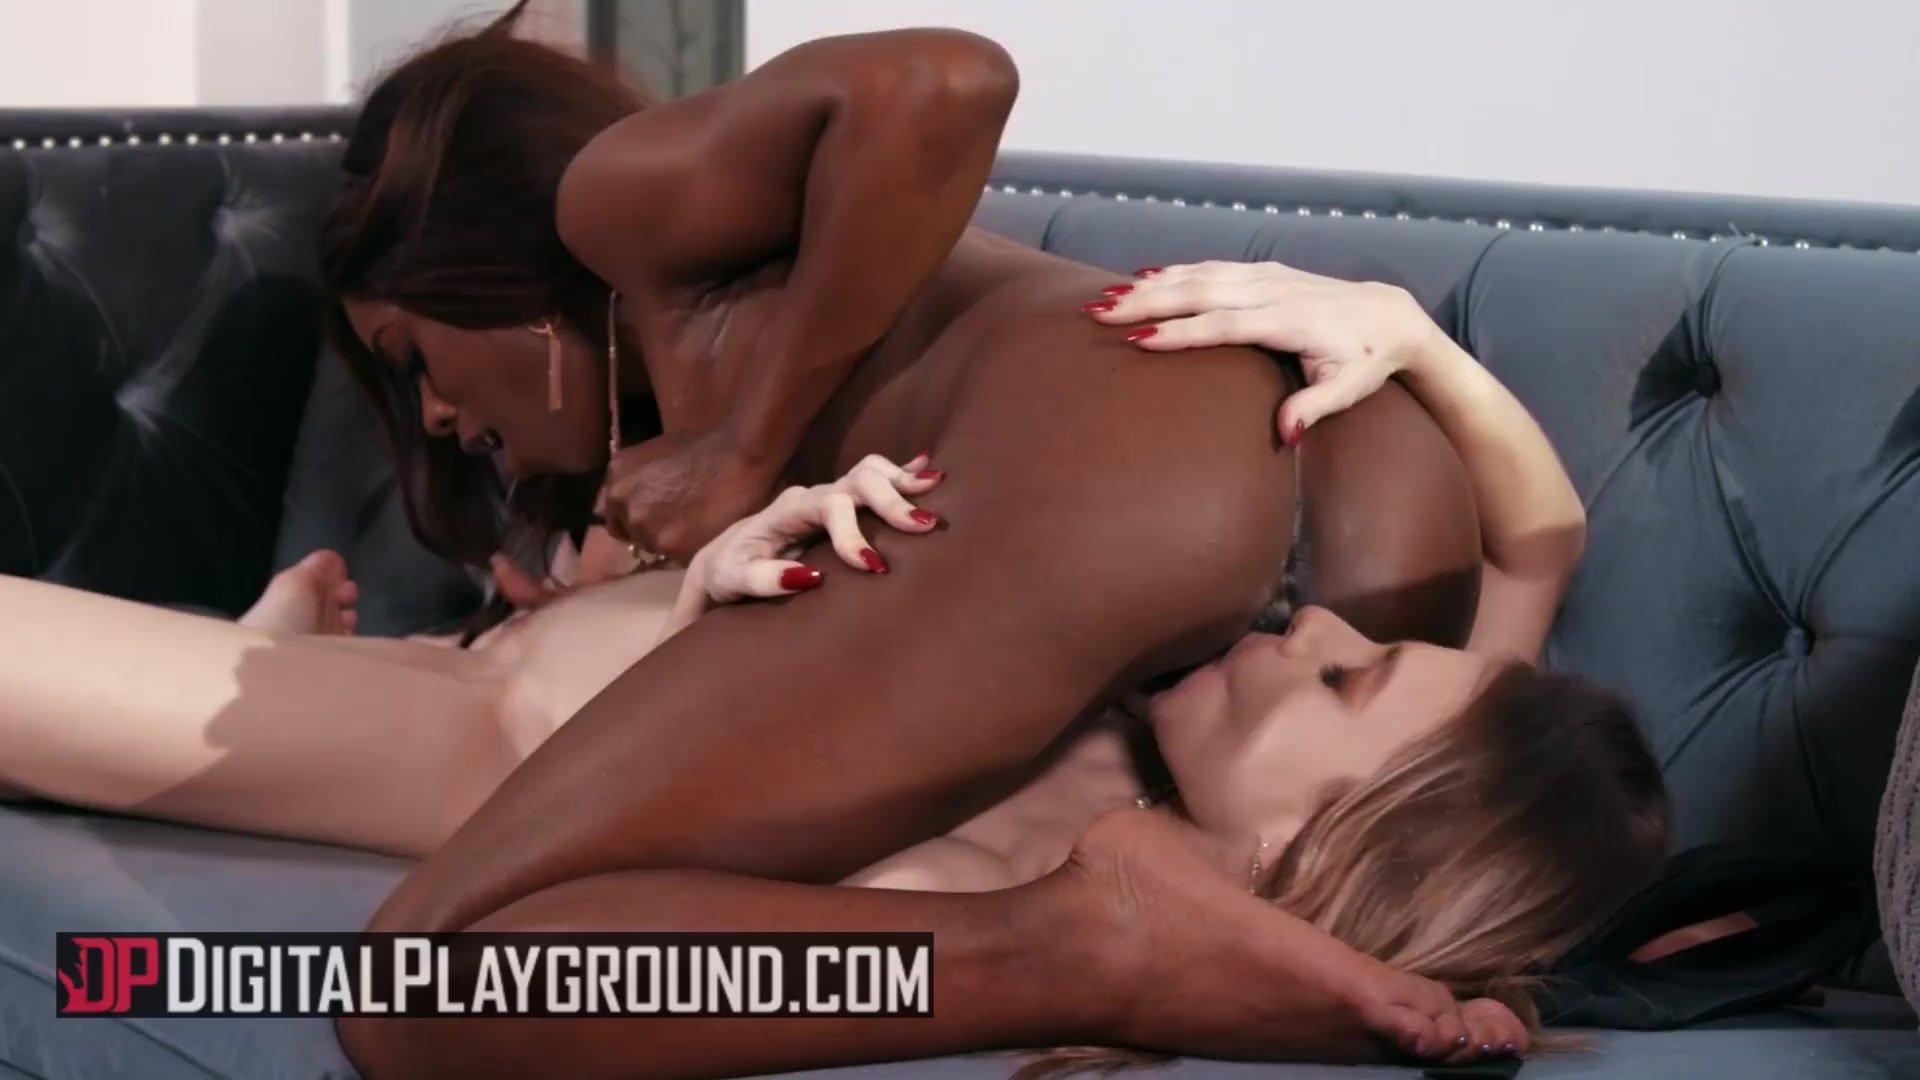 DigitalPlayground - Beautiful Anya Olson & Ana Foxxx love eating pussy